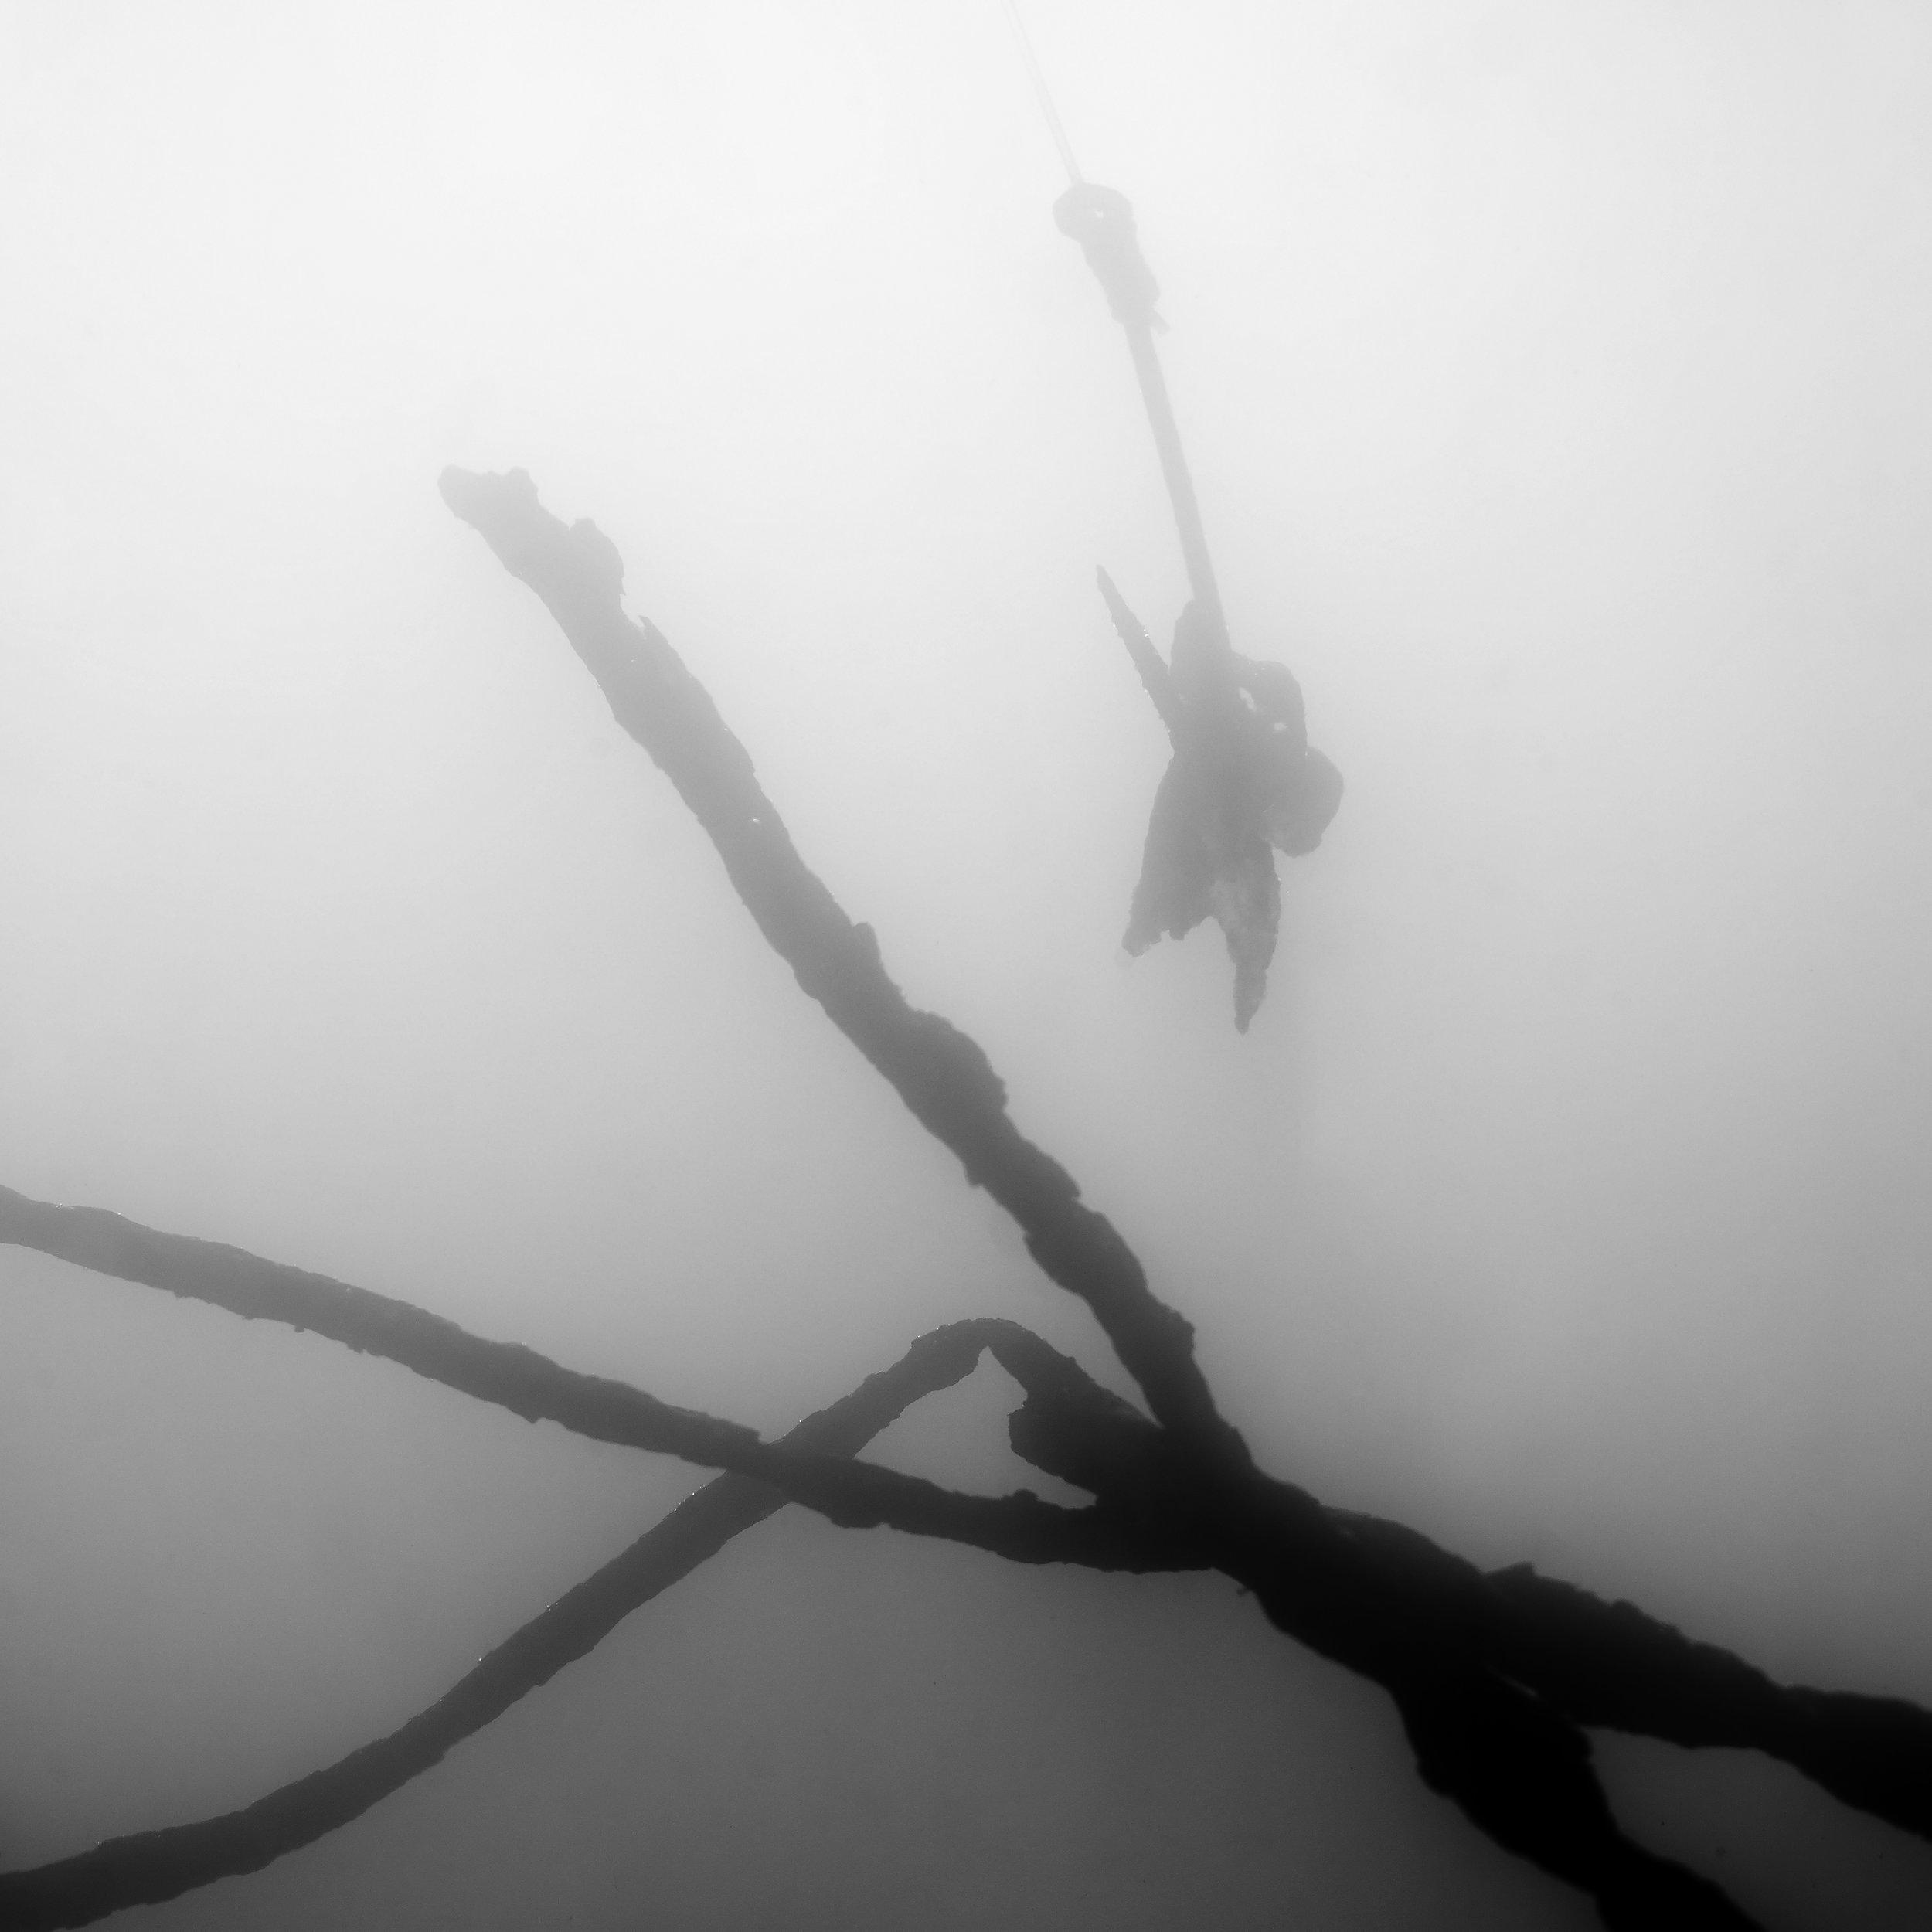 manta ray & sharks - fishing hook